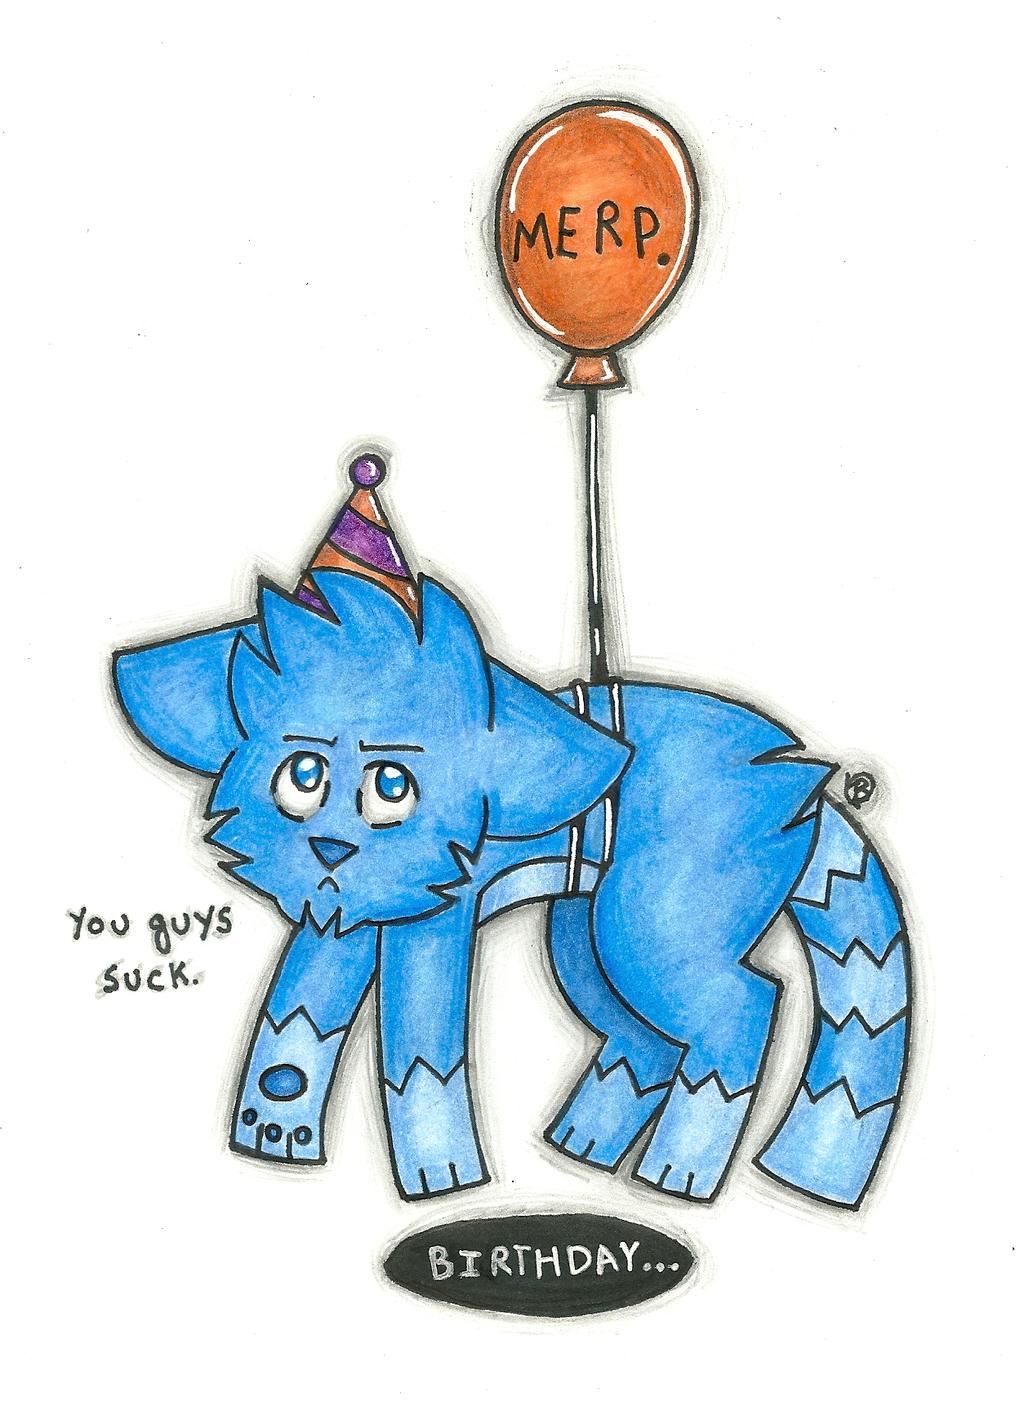 Happy Birthday! by Jersey-Cat